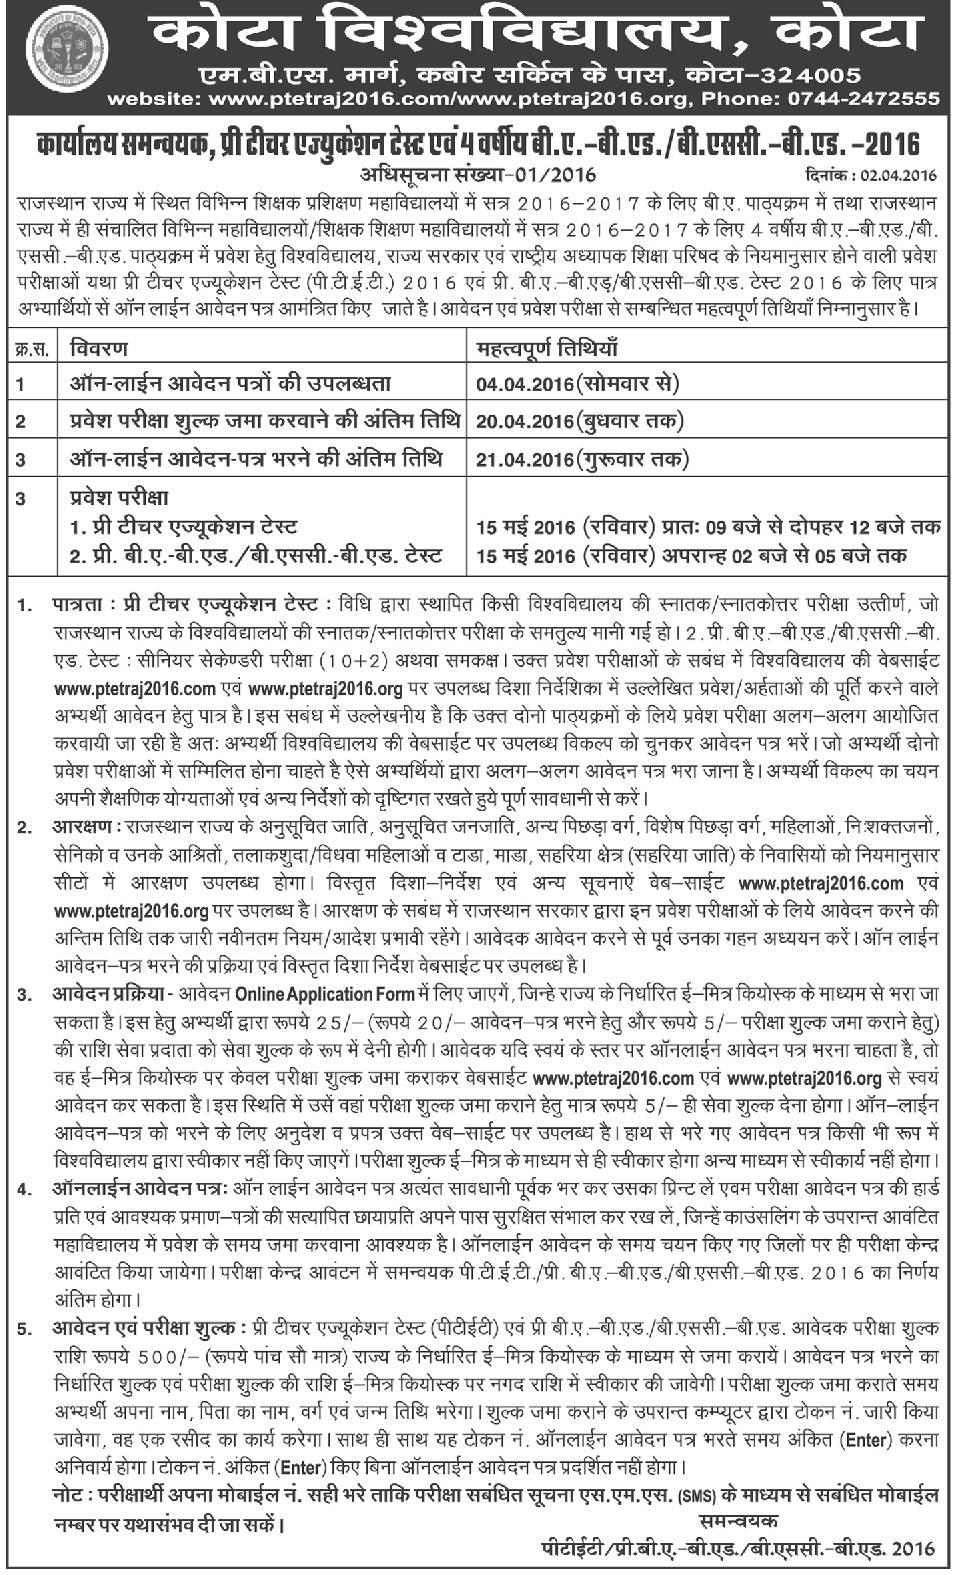 www.ptetraj2021.com Rajasthan Pre B.Ed Kota PTET 2021 Application Form